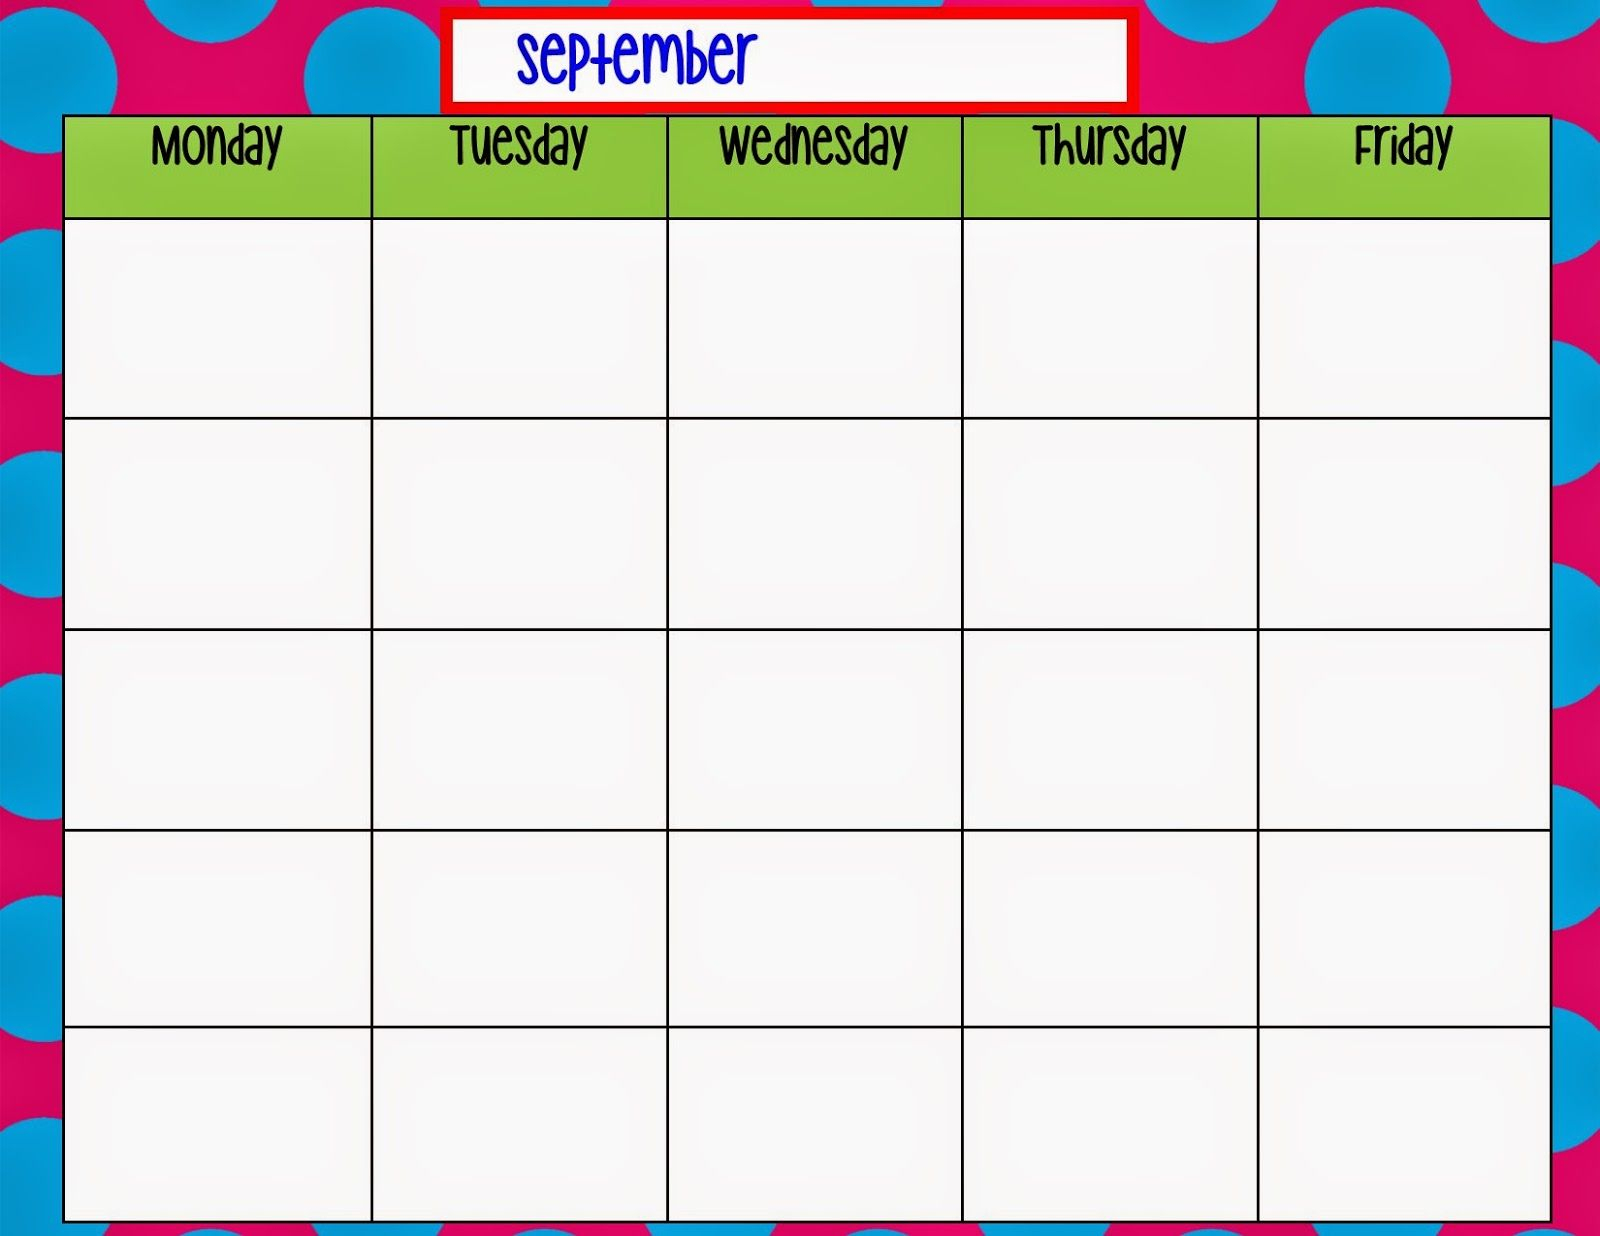 Monday Through Friday Calendar Template | Preschool | Weekly with regard to Blank Printable Calendar M-F